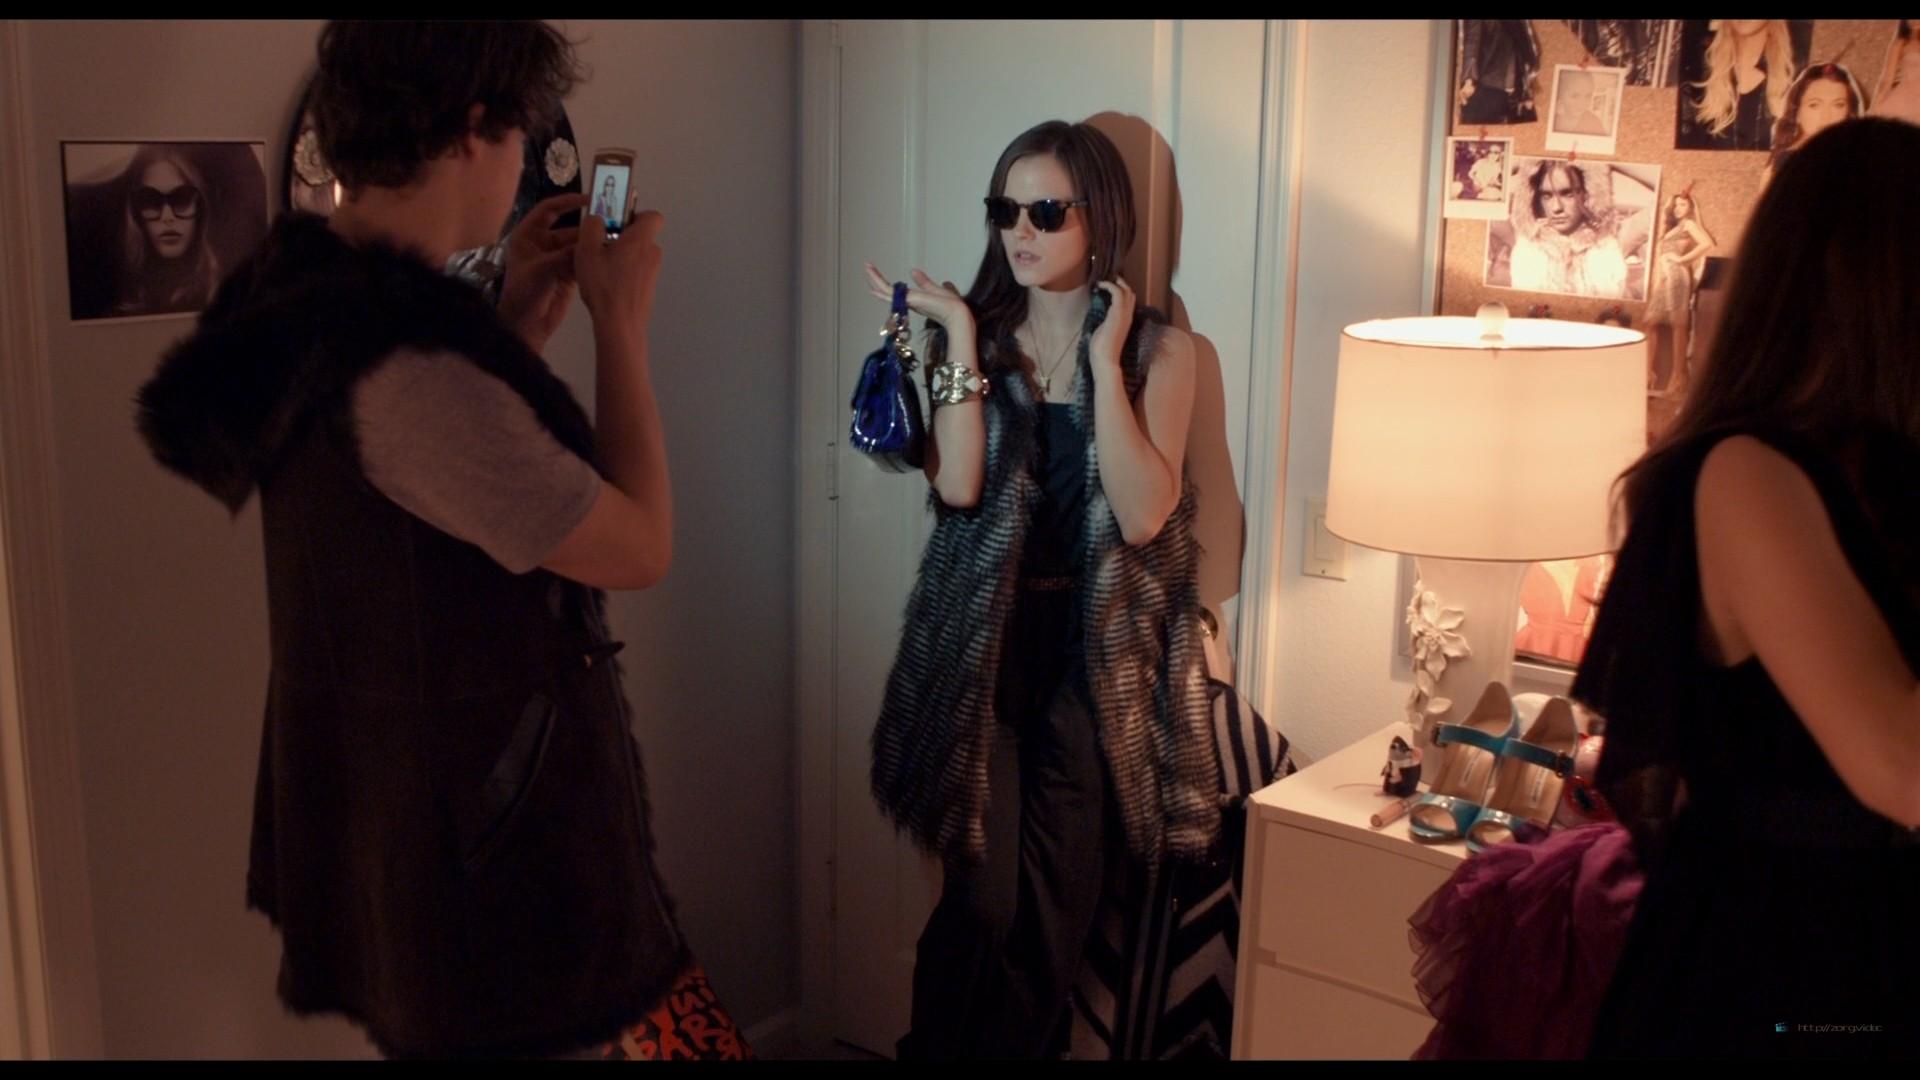 Emma Watson hot Taissa Farmiga and others sexy - The Bling Ring (2013) HD 1080p BluRay (11)